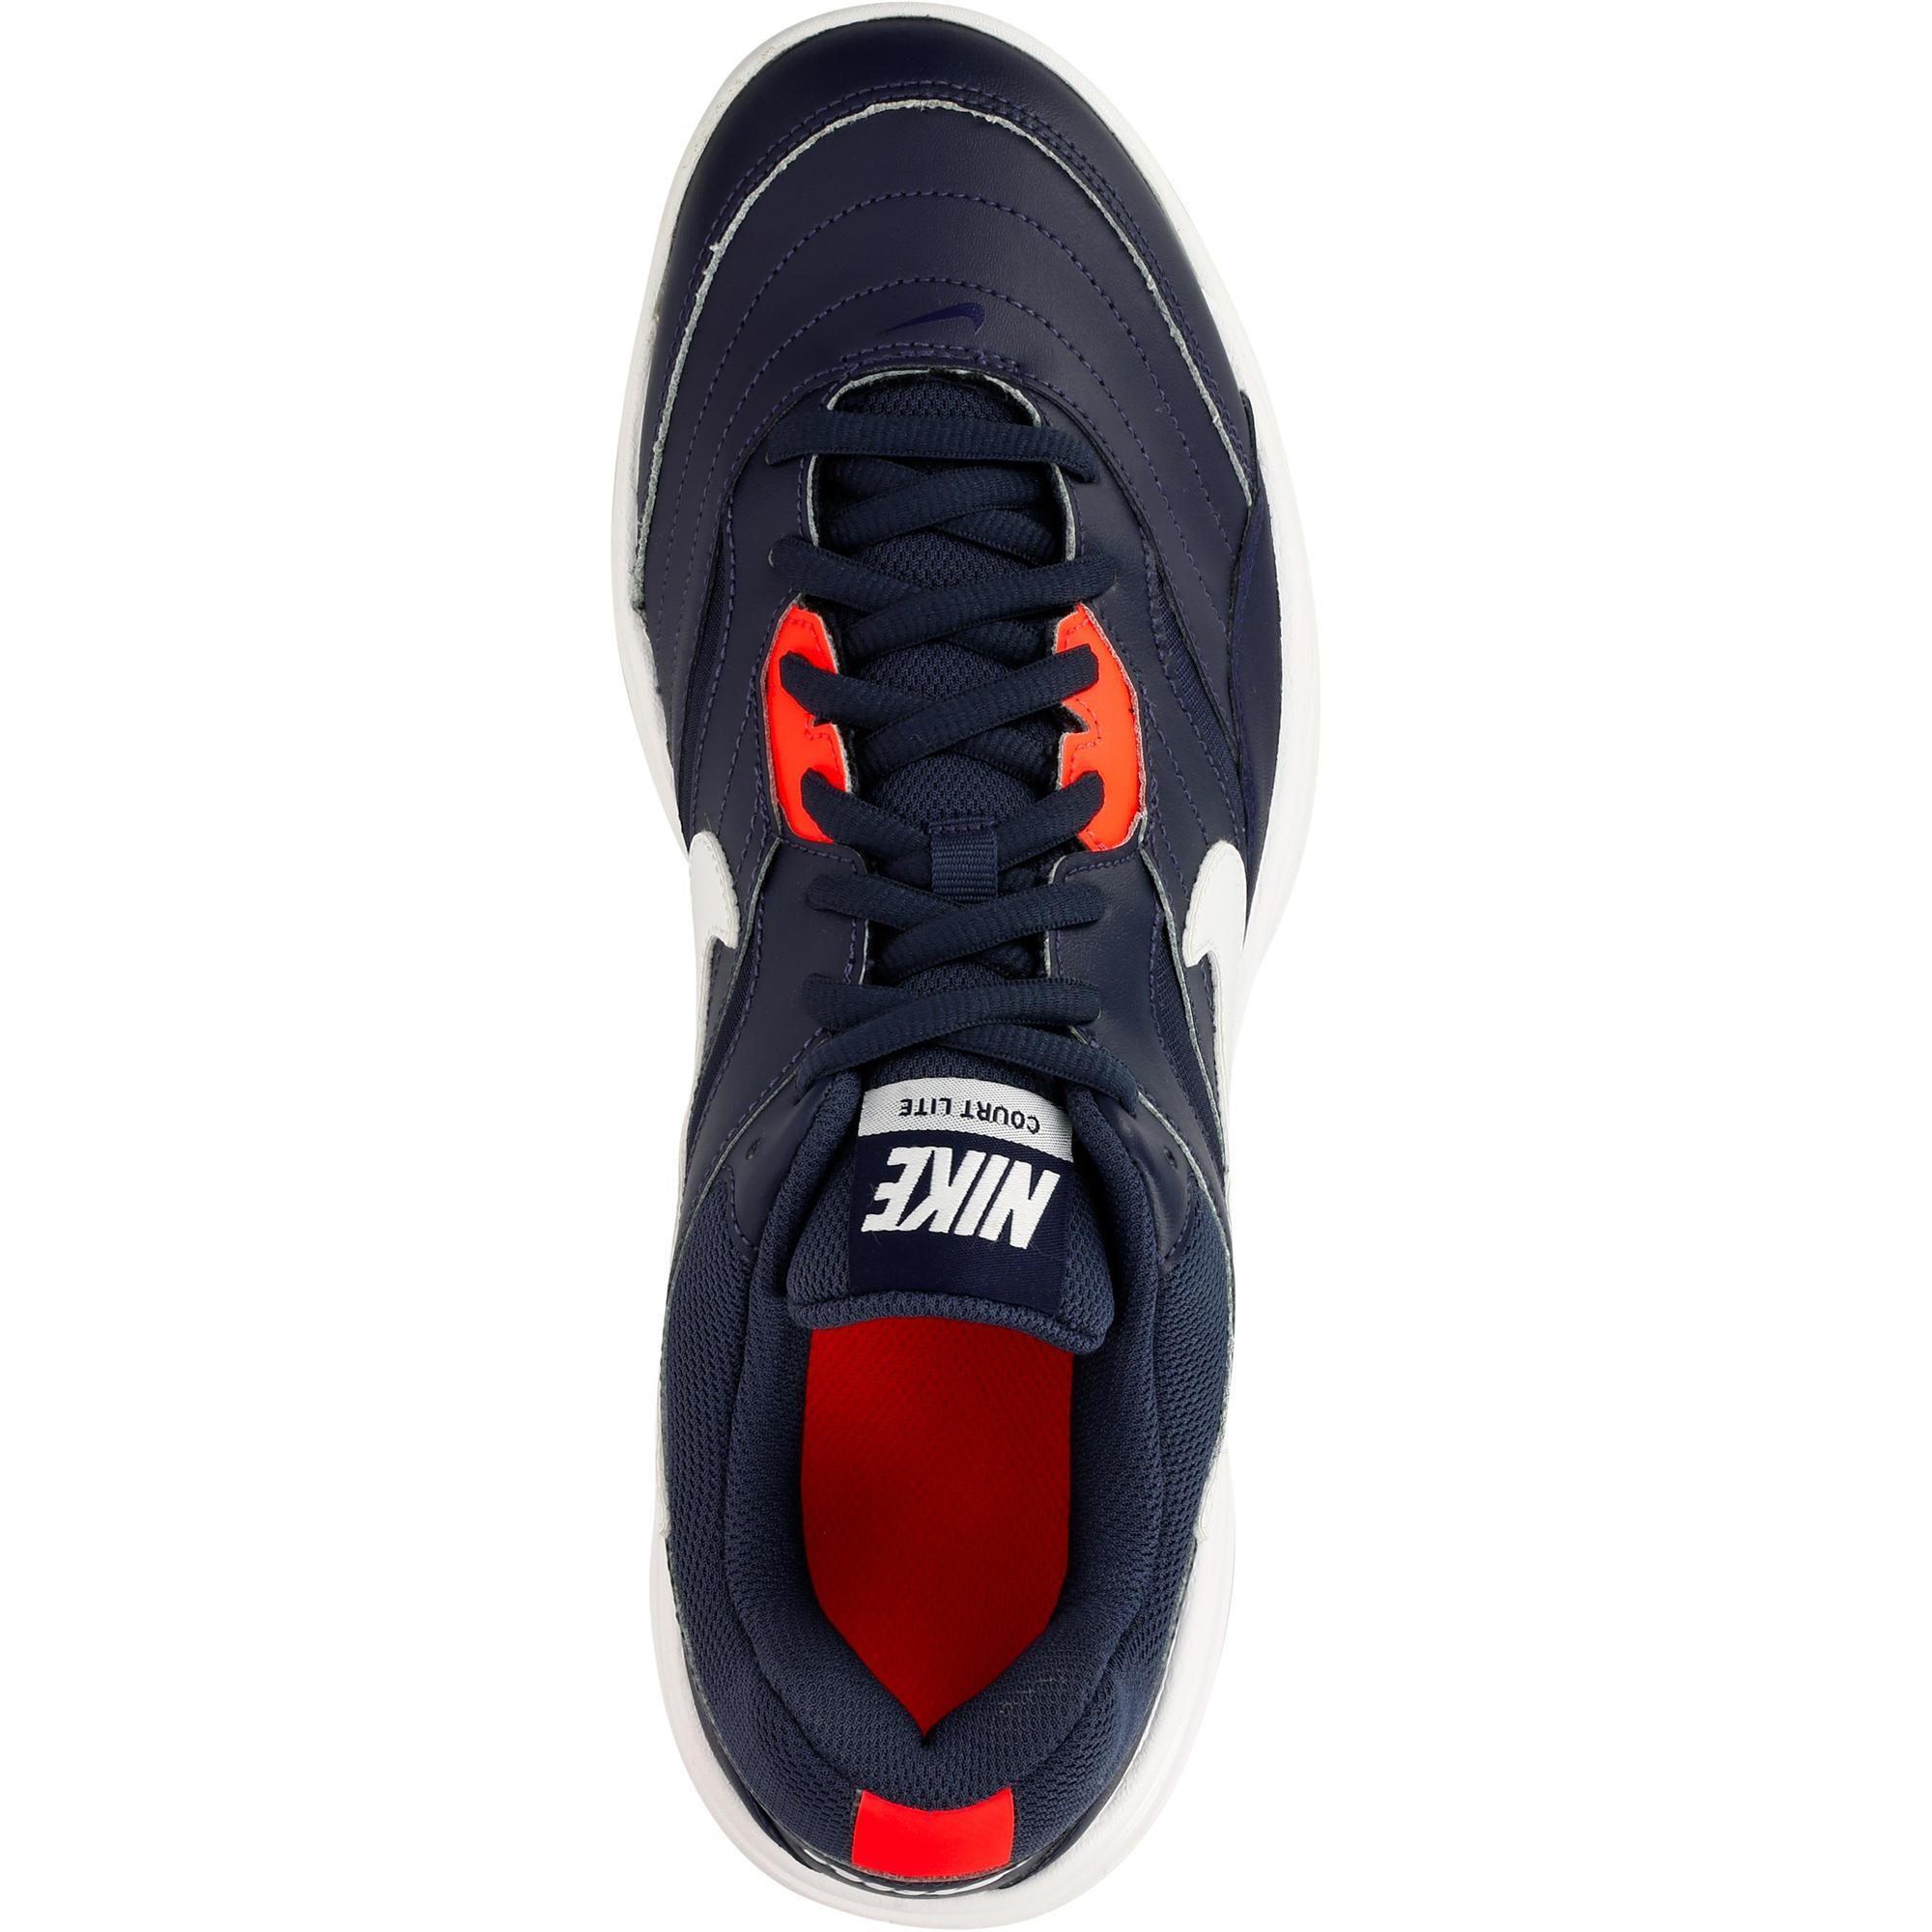 online store 54bf9 ede63 Court Terre Lite Decathlon Bleu Battue Chaussures Nike Tennis qH0qIPwFd